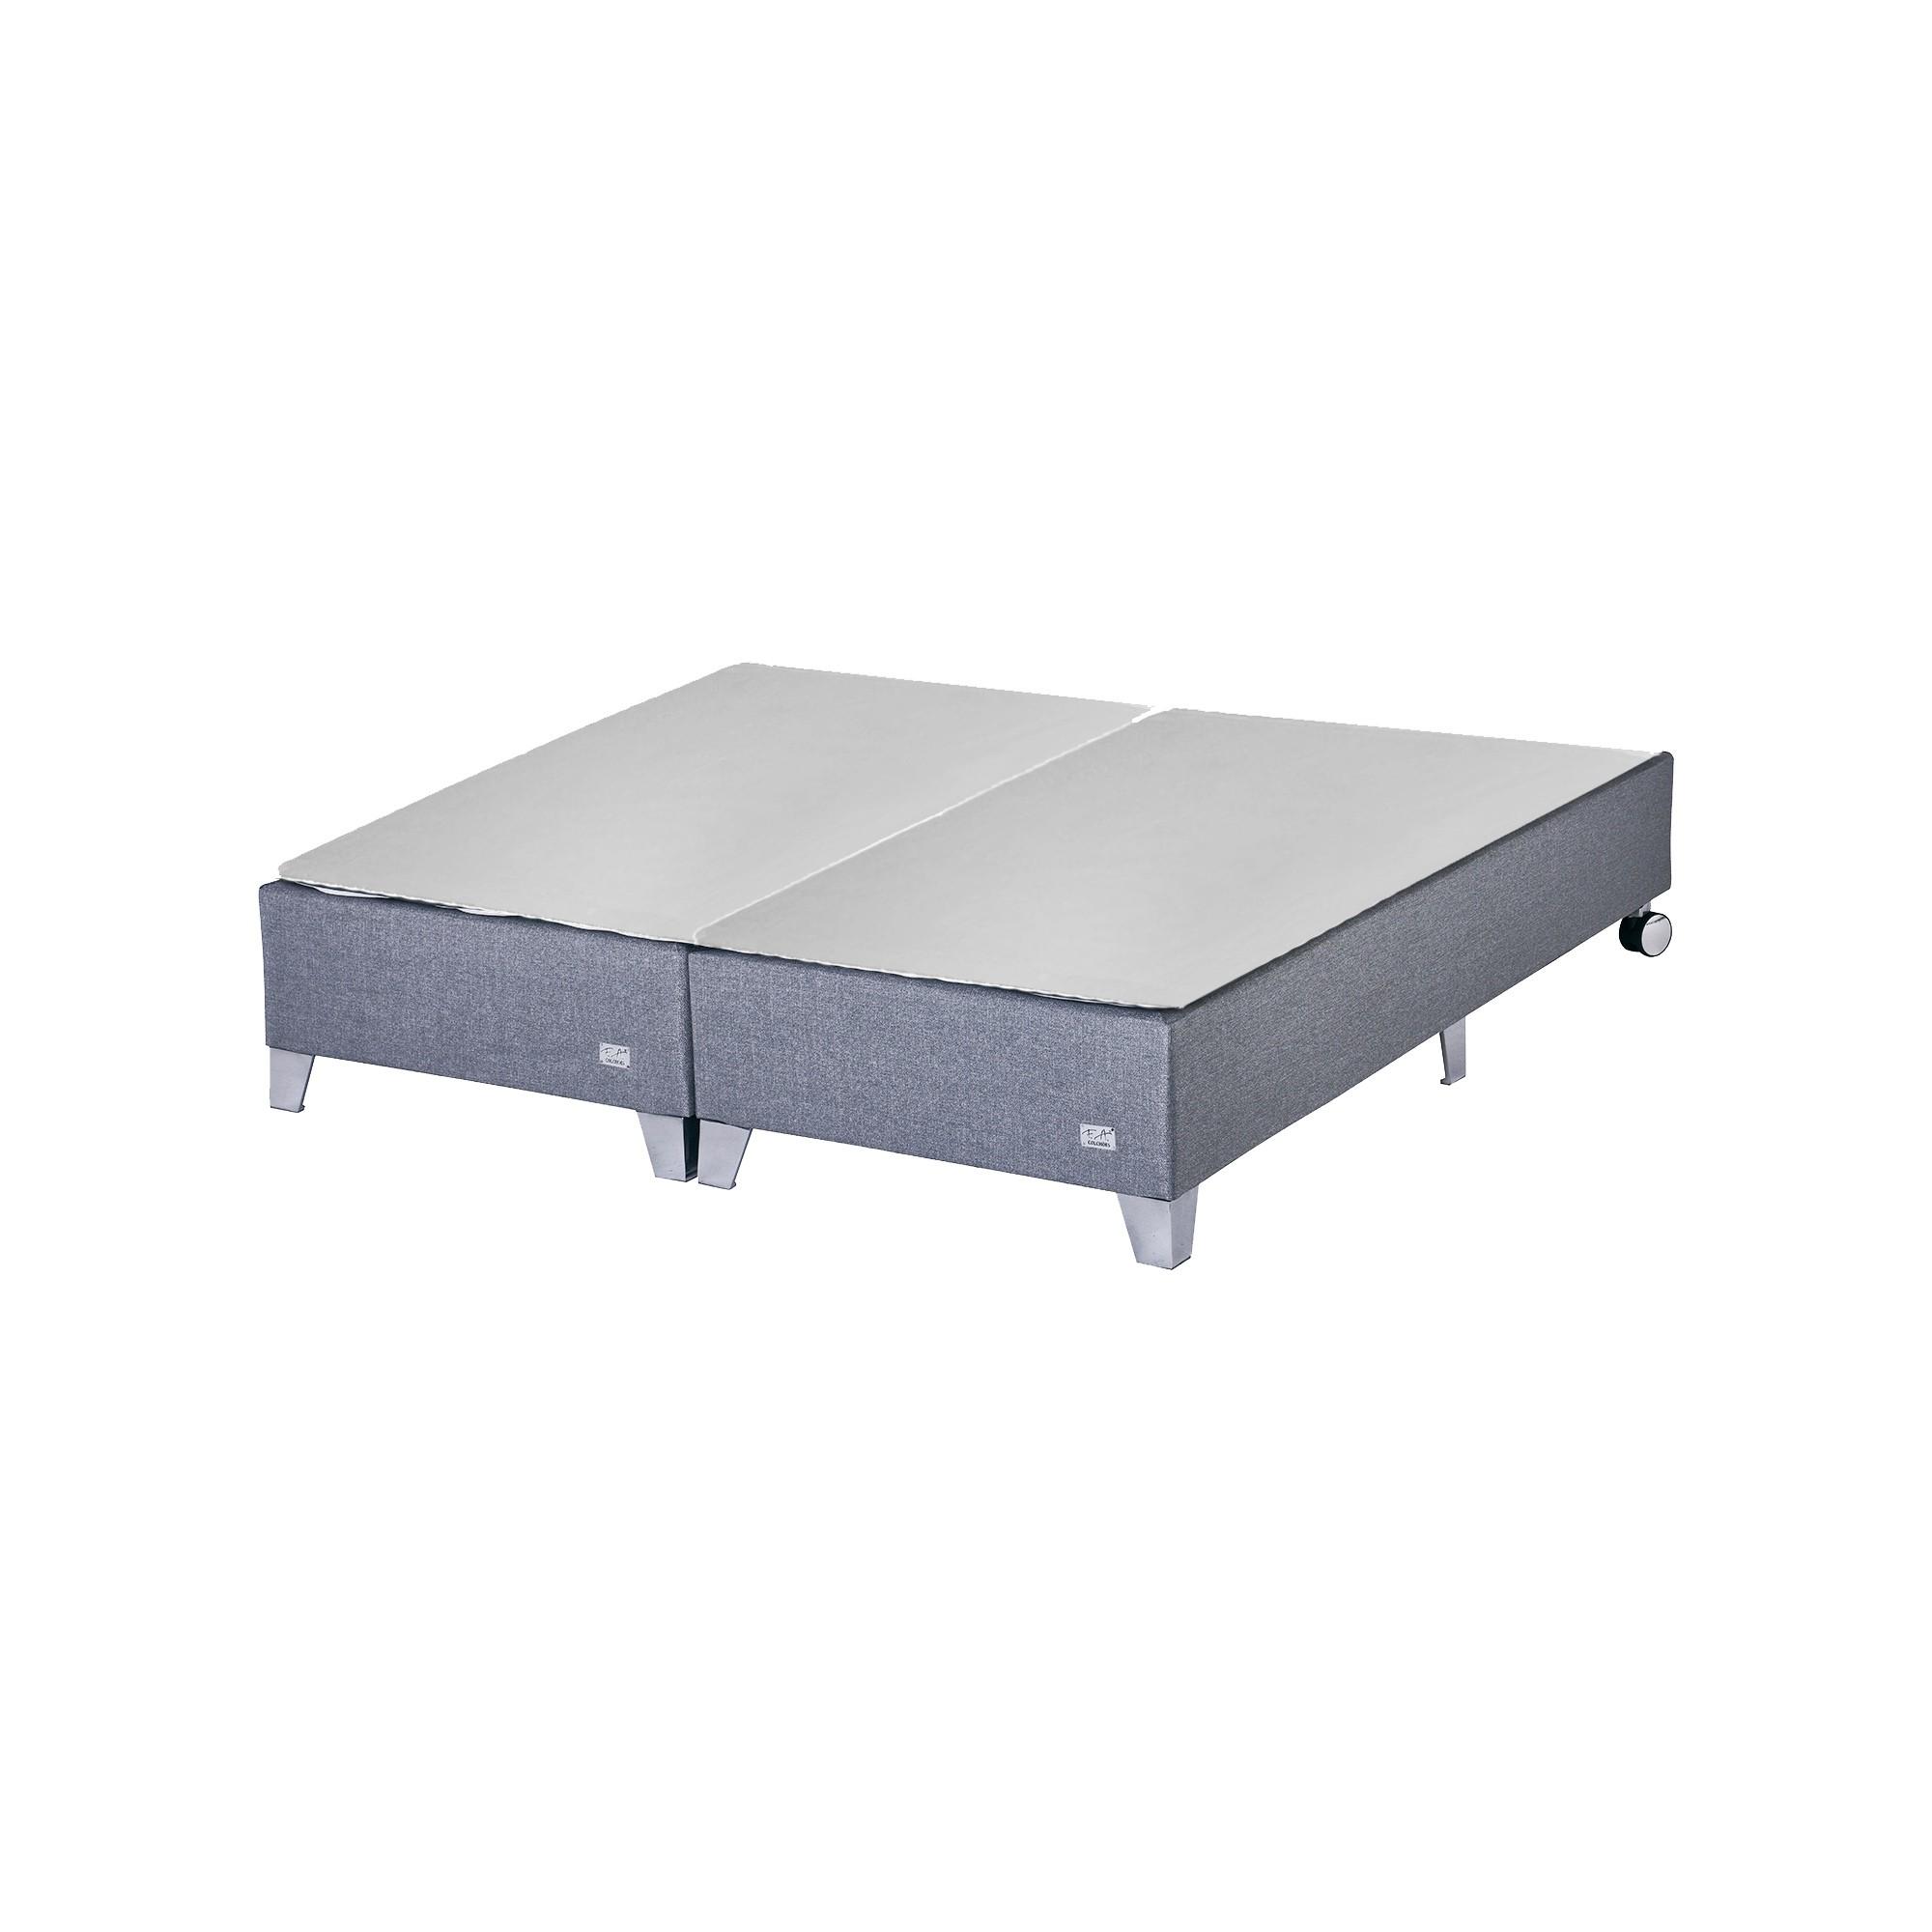 Box F.A. Colchões Premium Cinza 25 cm [King 193 x 203 cm]